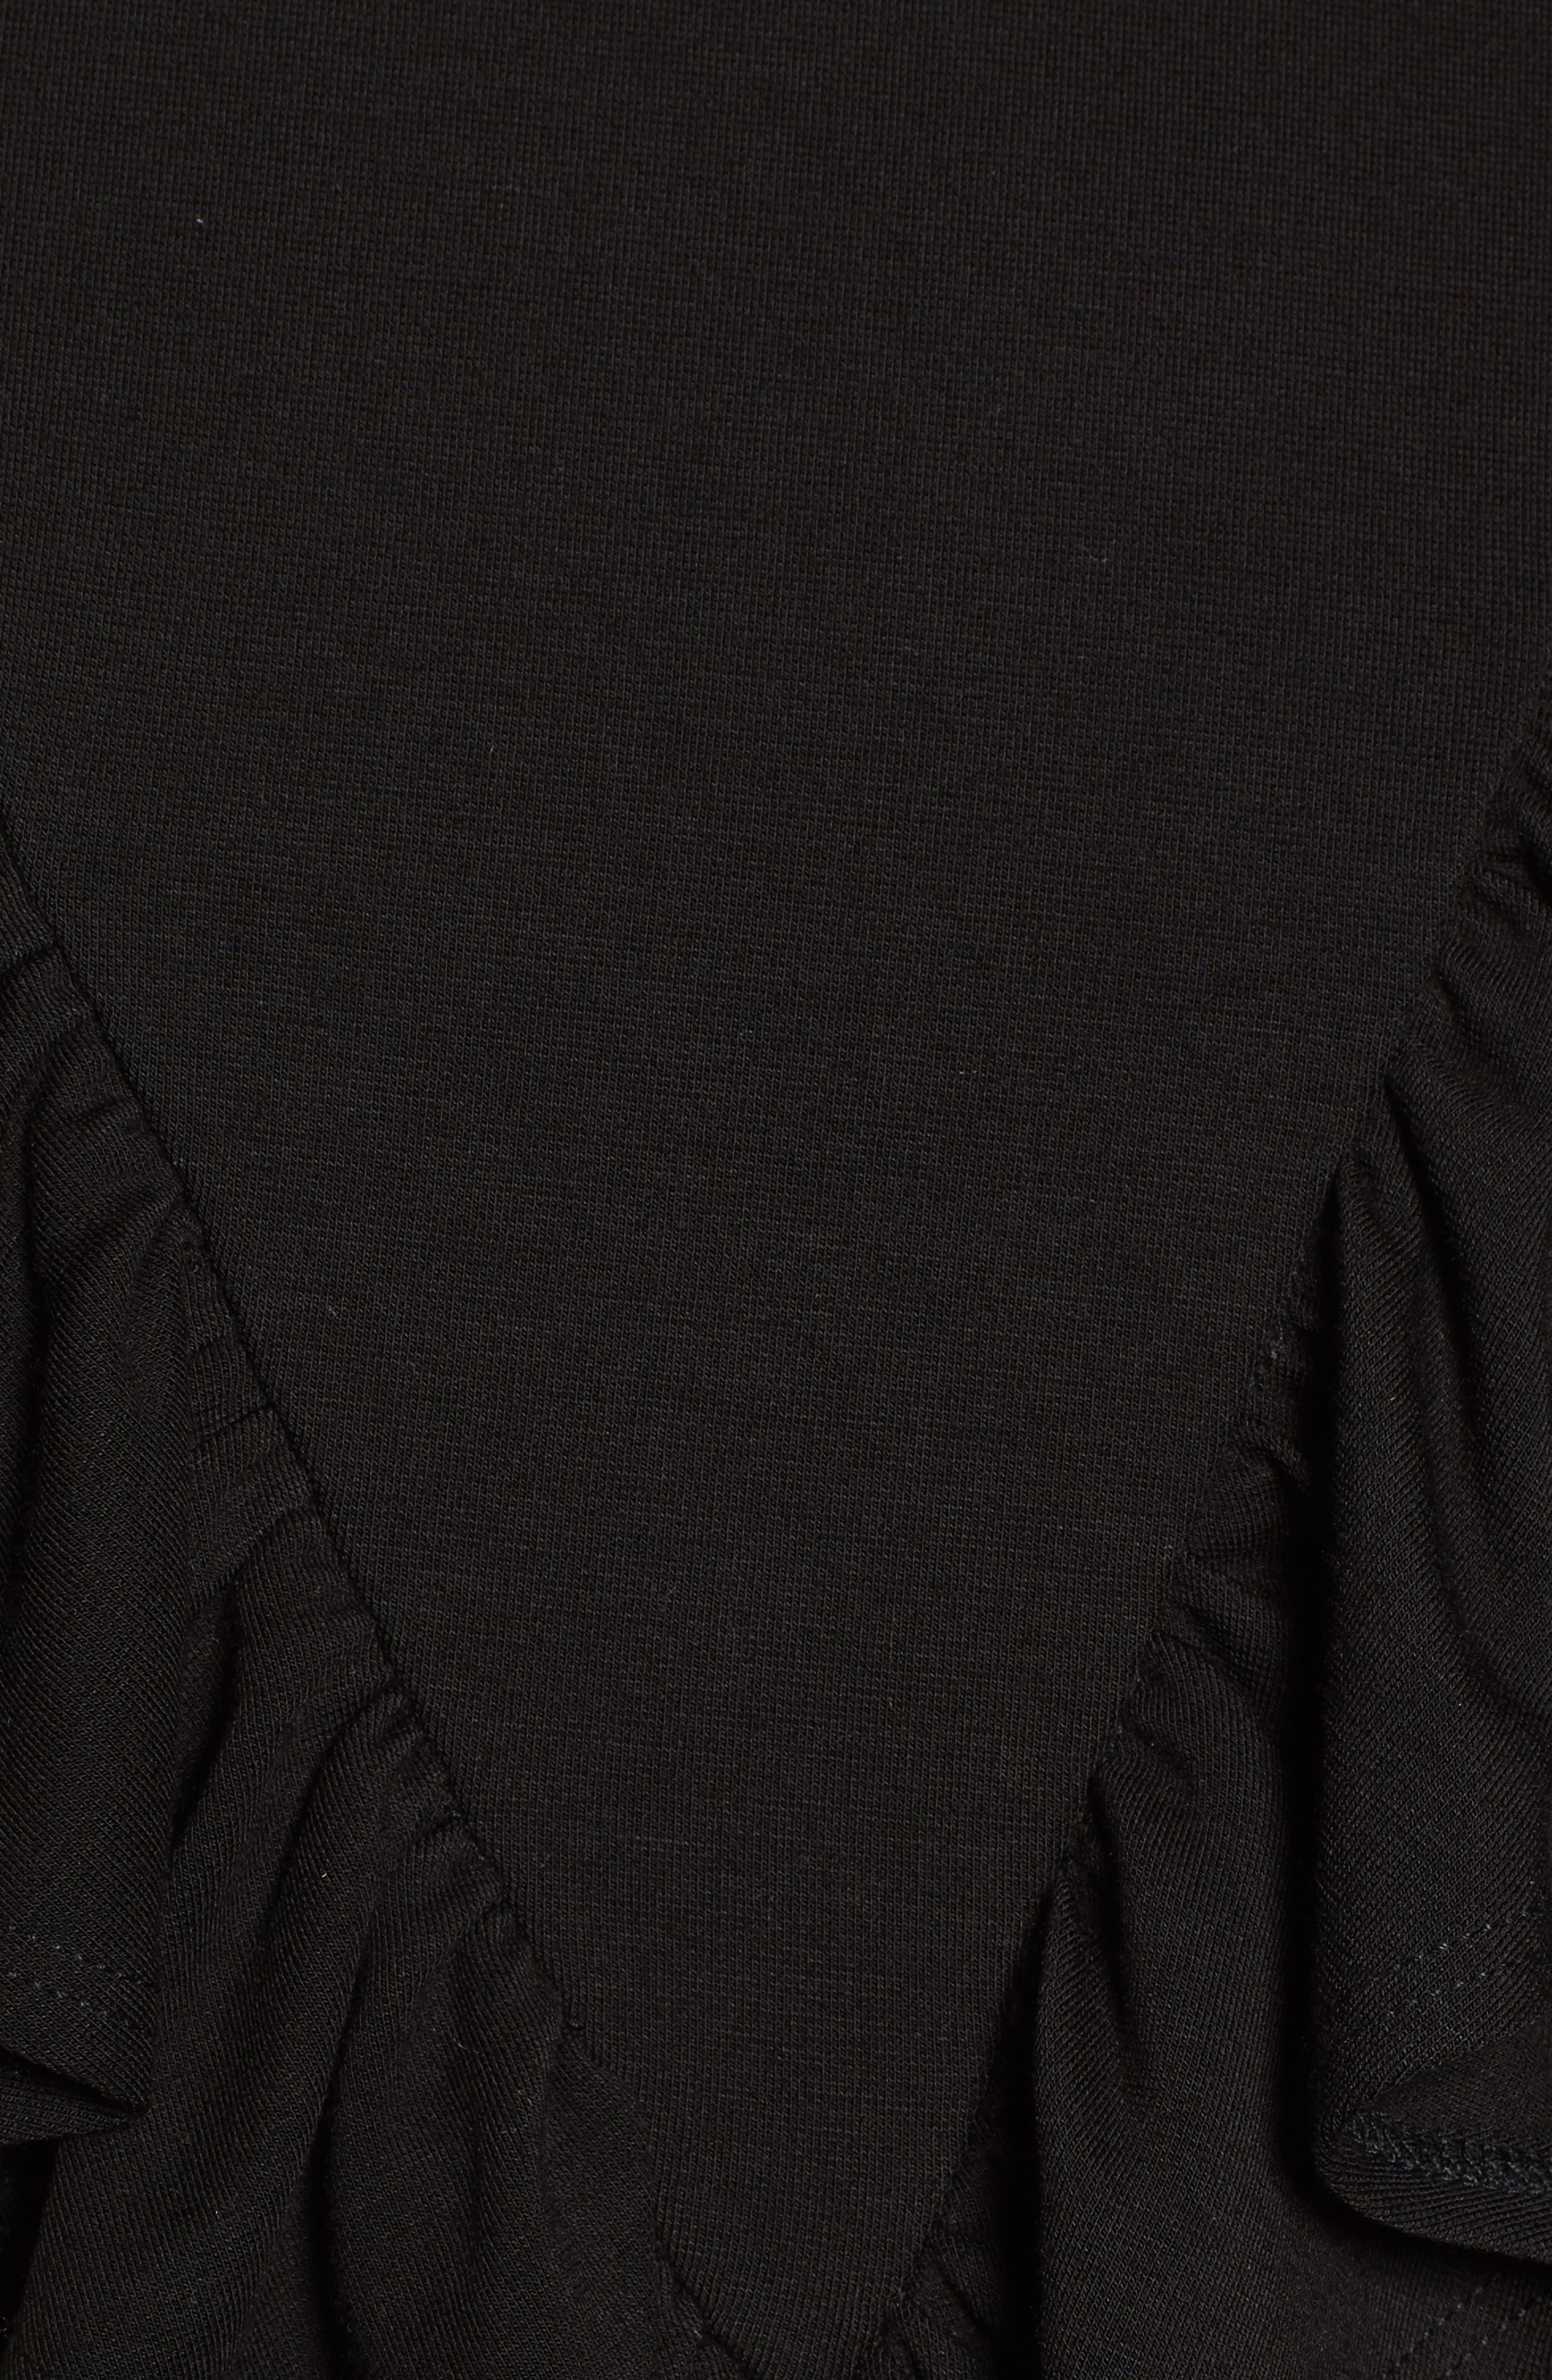 Ruffle Ponte Sweater,                             Alternate thumbnail 5, color,                             001